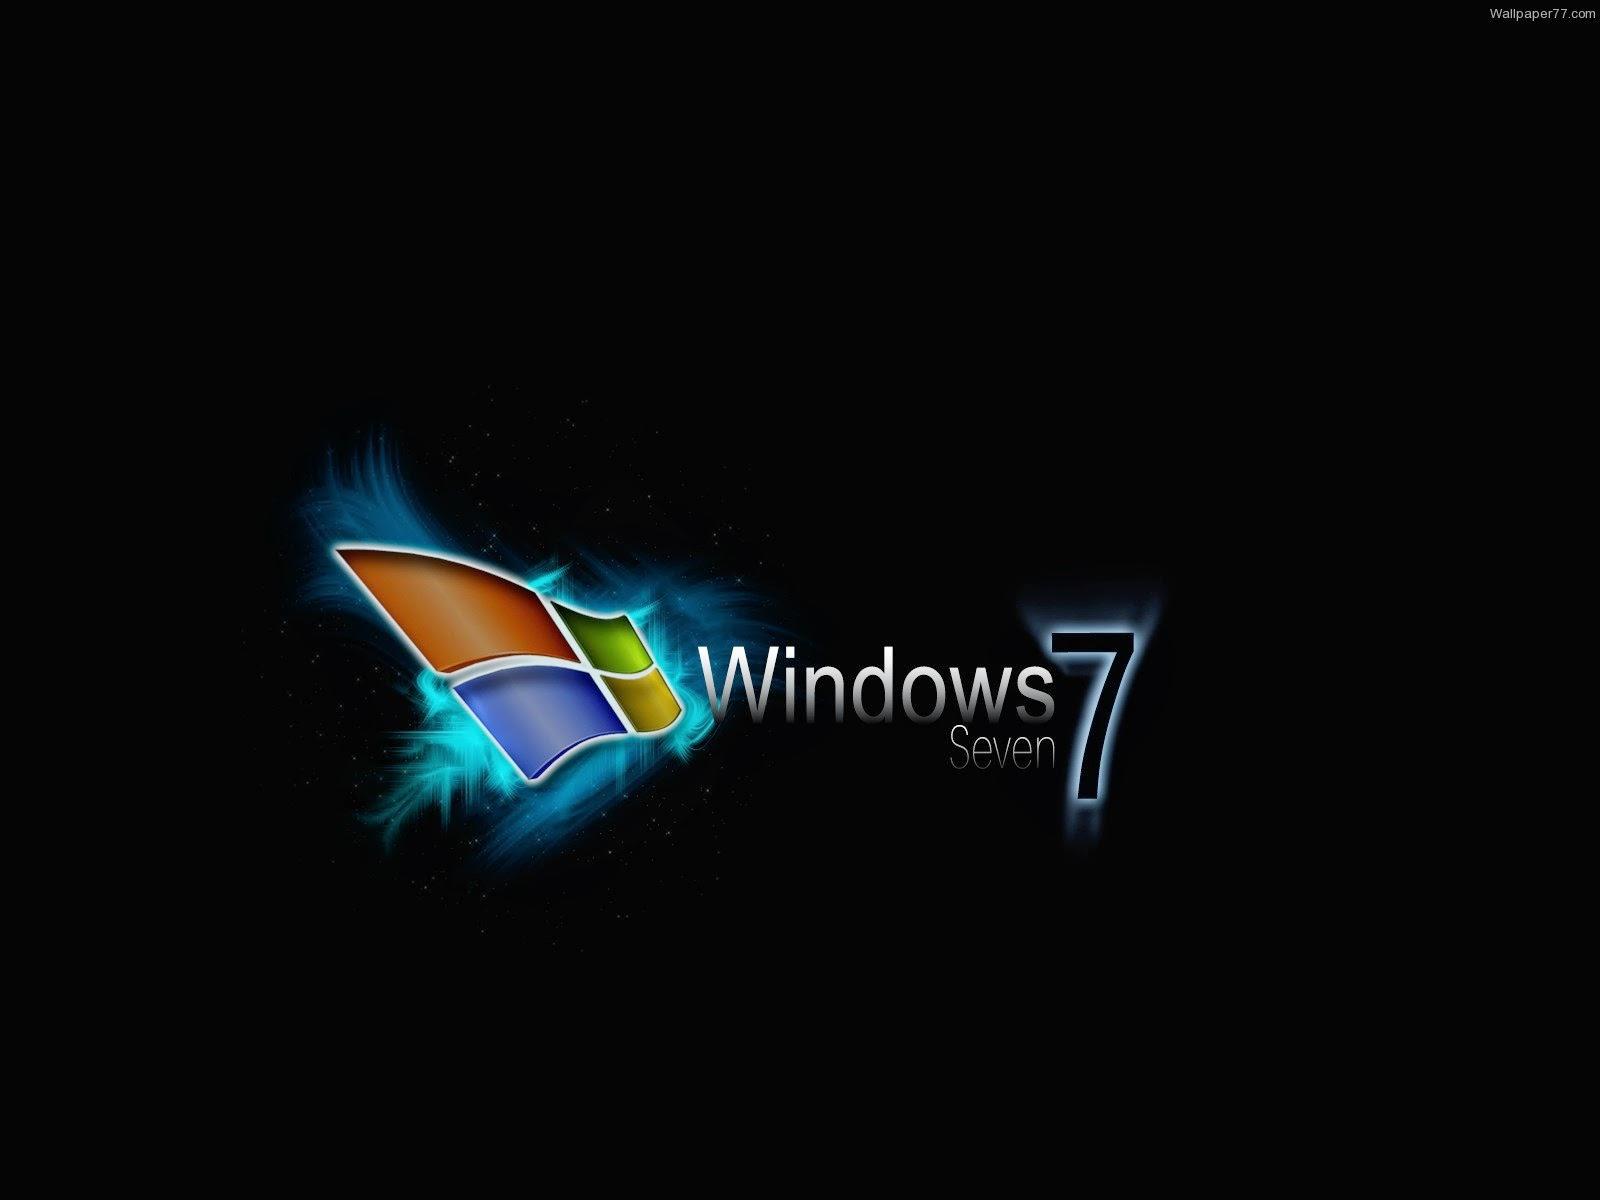 Windows 7 desktop cartoon